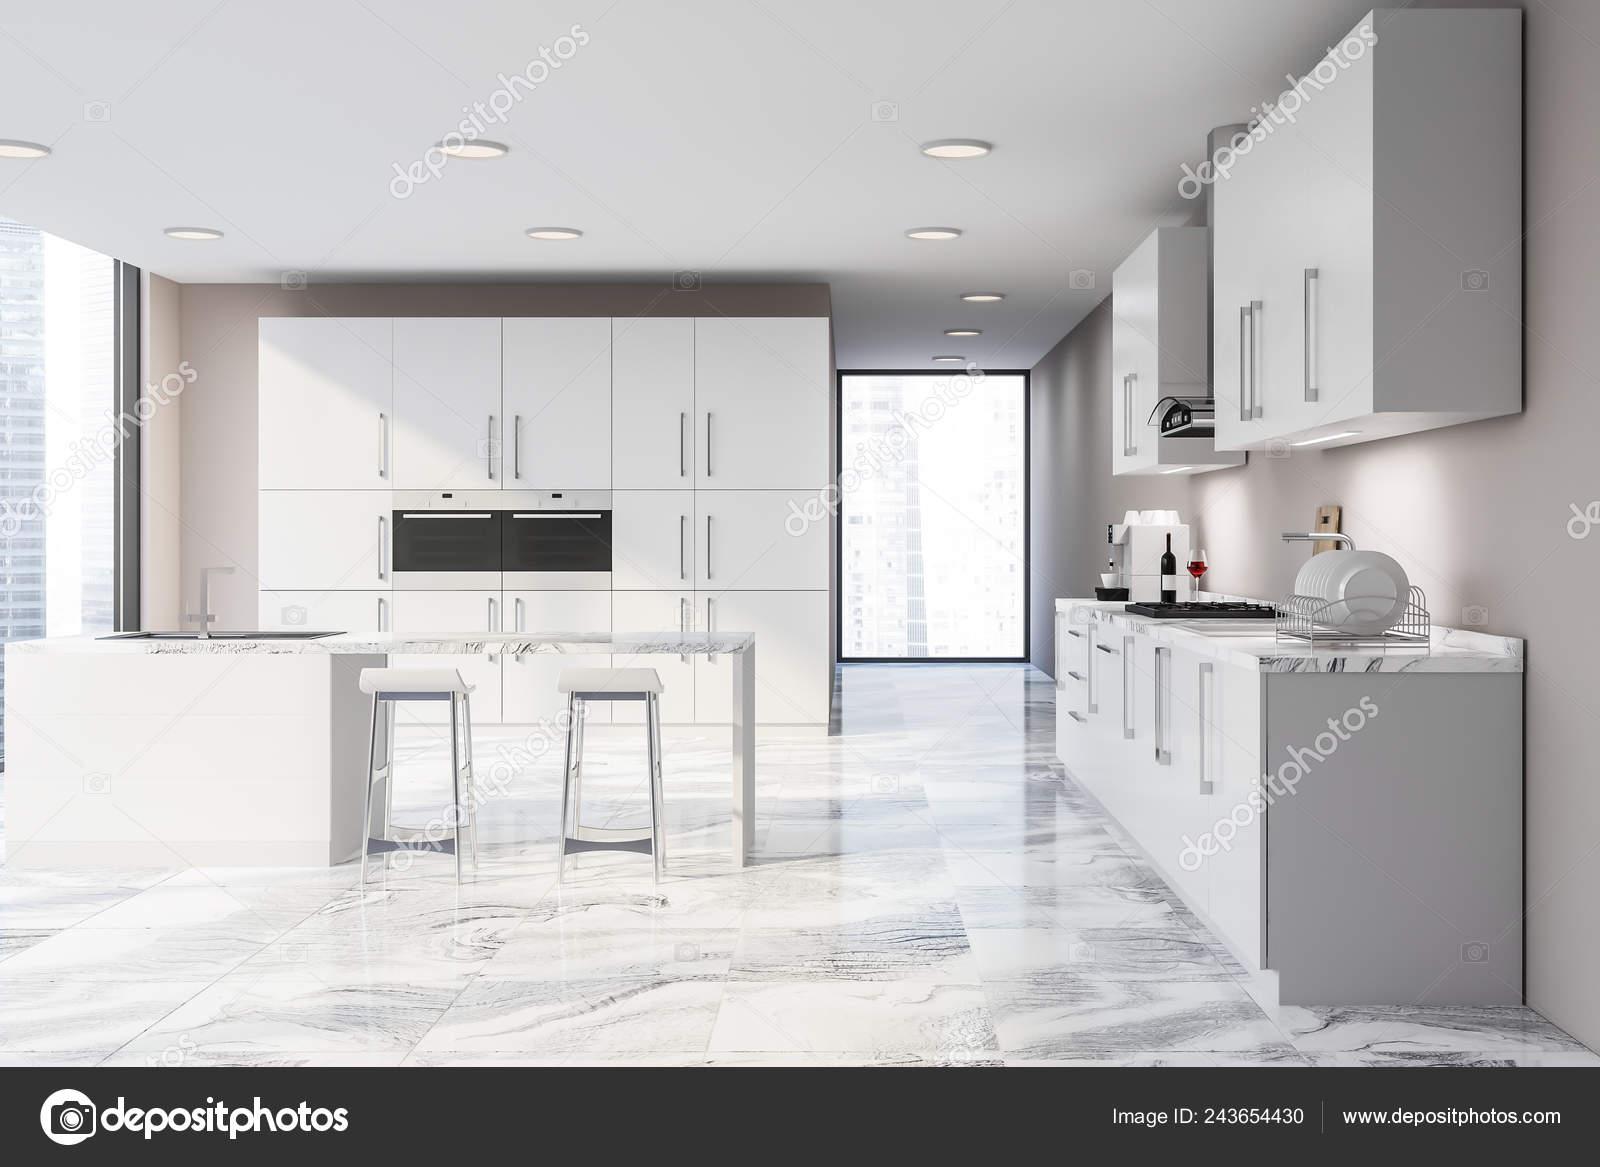 Interior Stylish Kitchen Beige Walls White Marble Floor Bar Stools Stock Photo C Denisismagilov 243654430